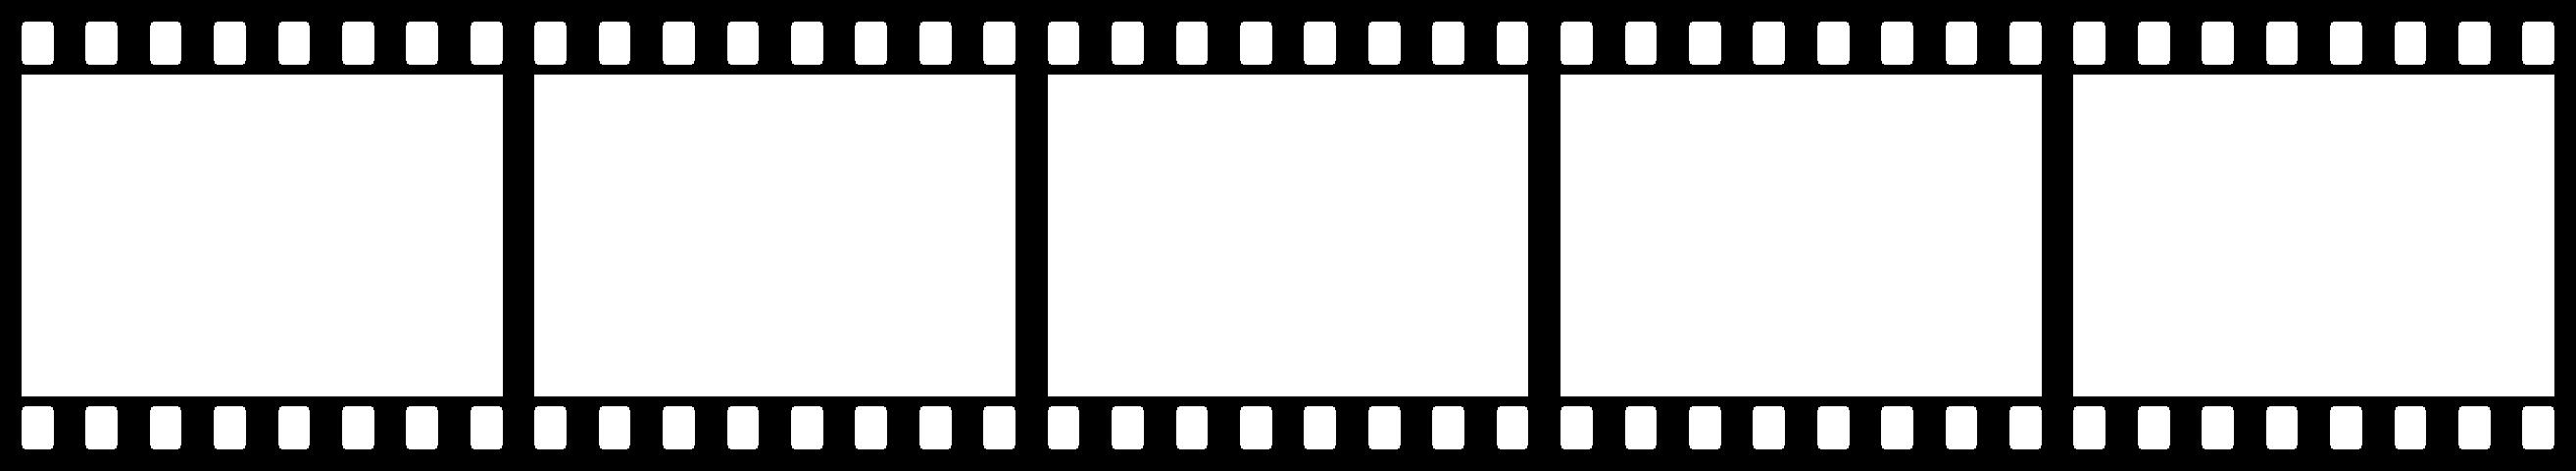 Film Reel Graphic - ClipArt Best